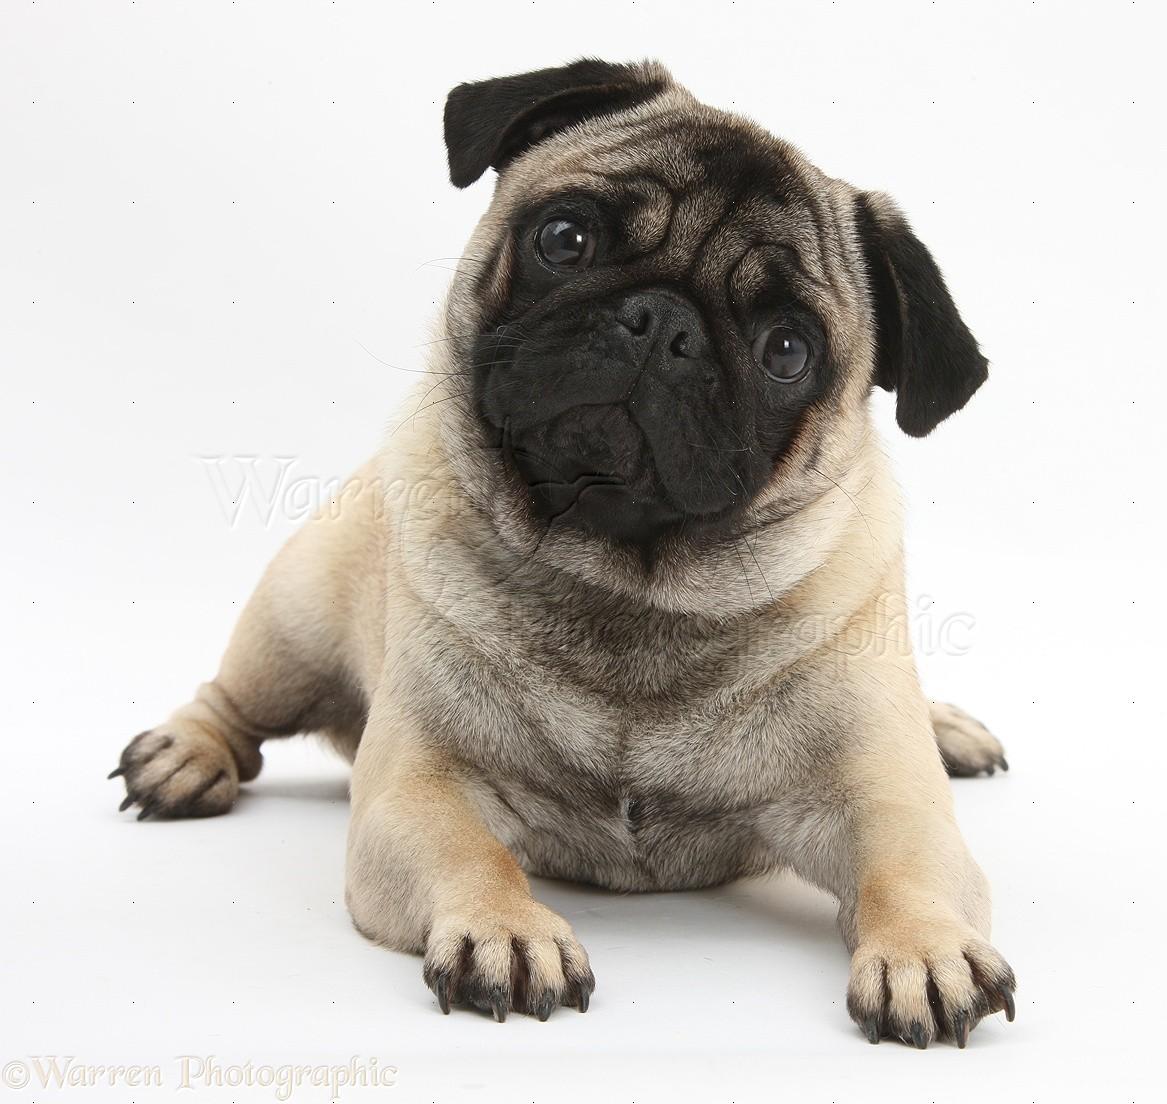 Pug dog pug nose dogs cute pug dog puggle dog breed beagle pug dog